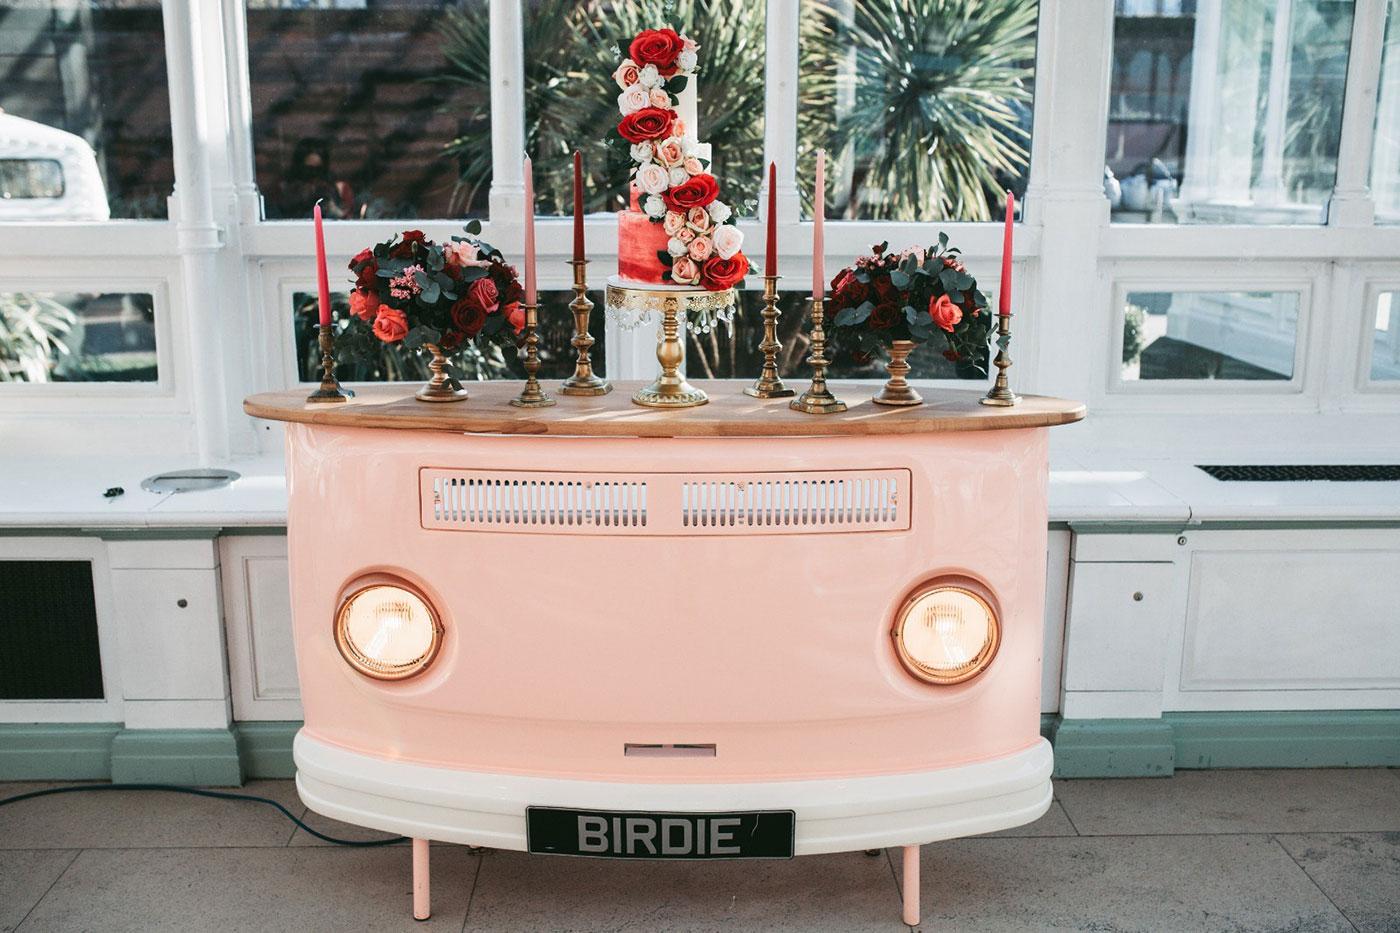 Birdie Campervan Photo Booth